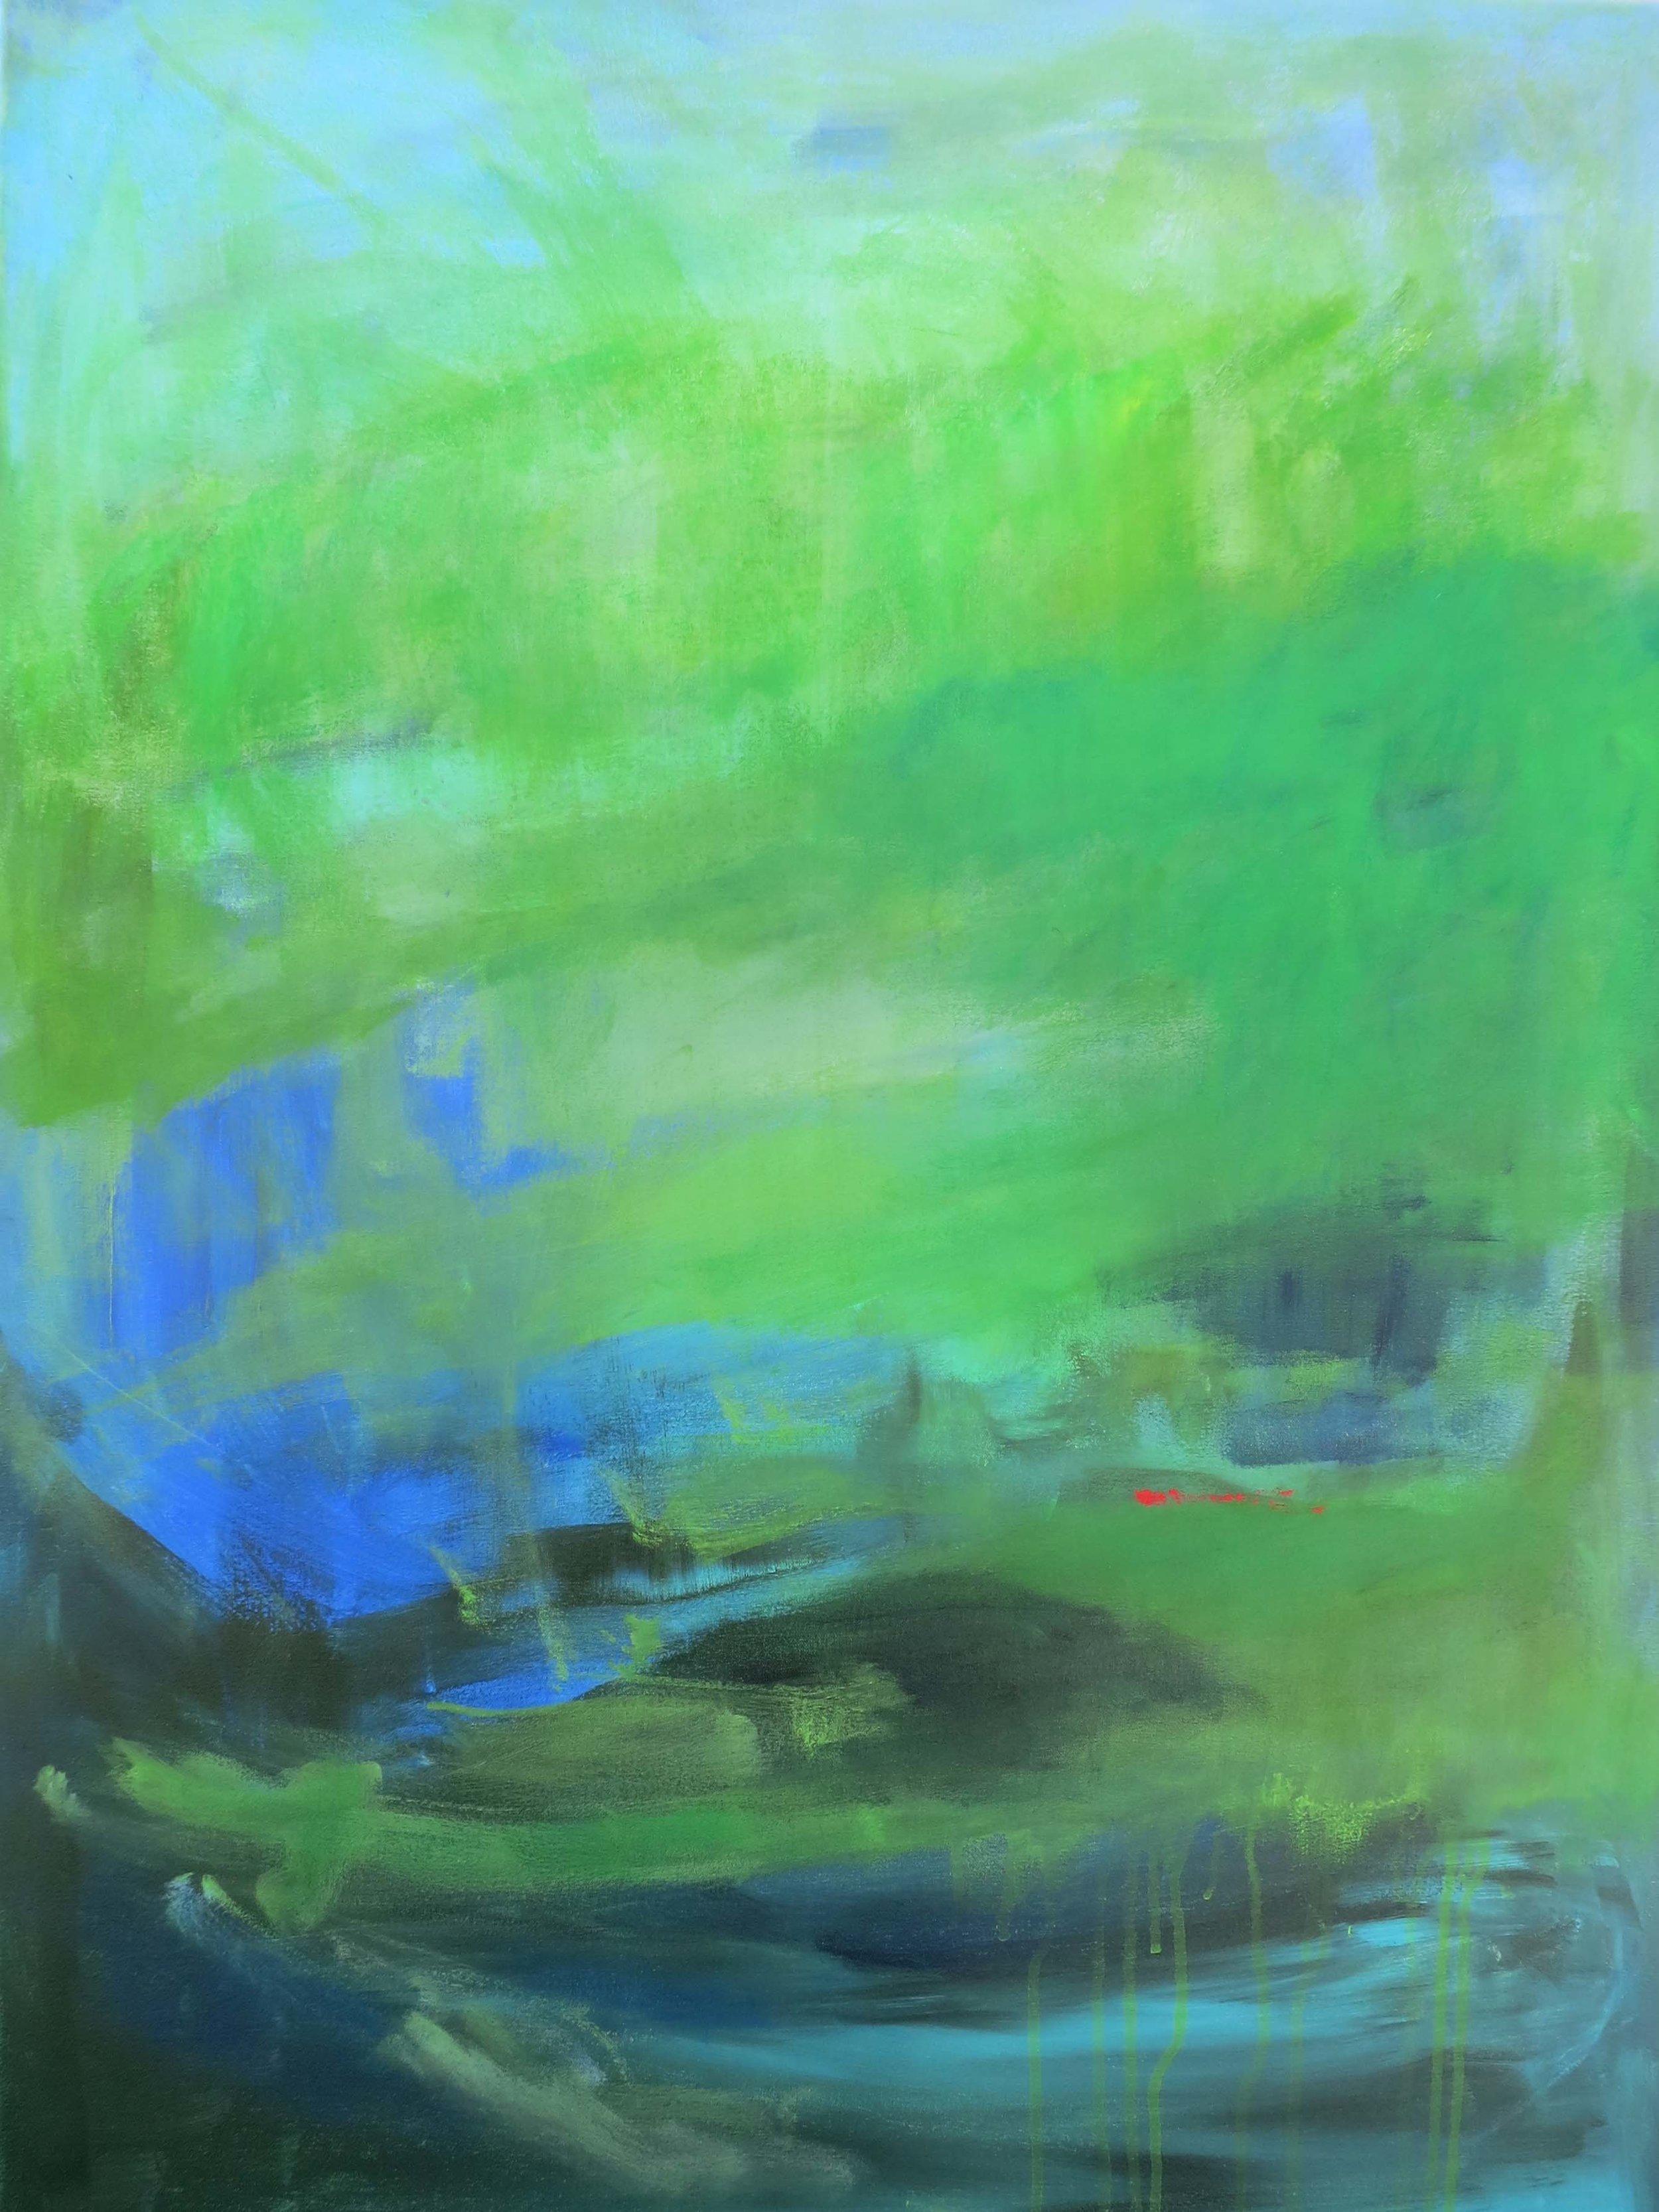 """Enlightenment"", acrylic, 40 x 30"", $1,500"